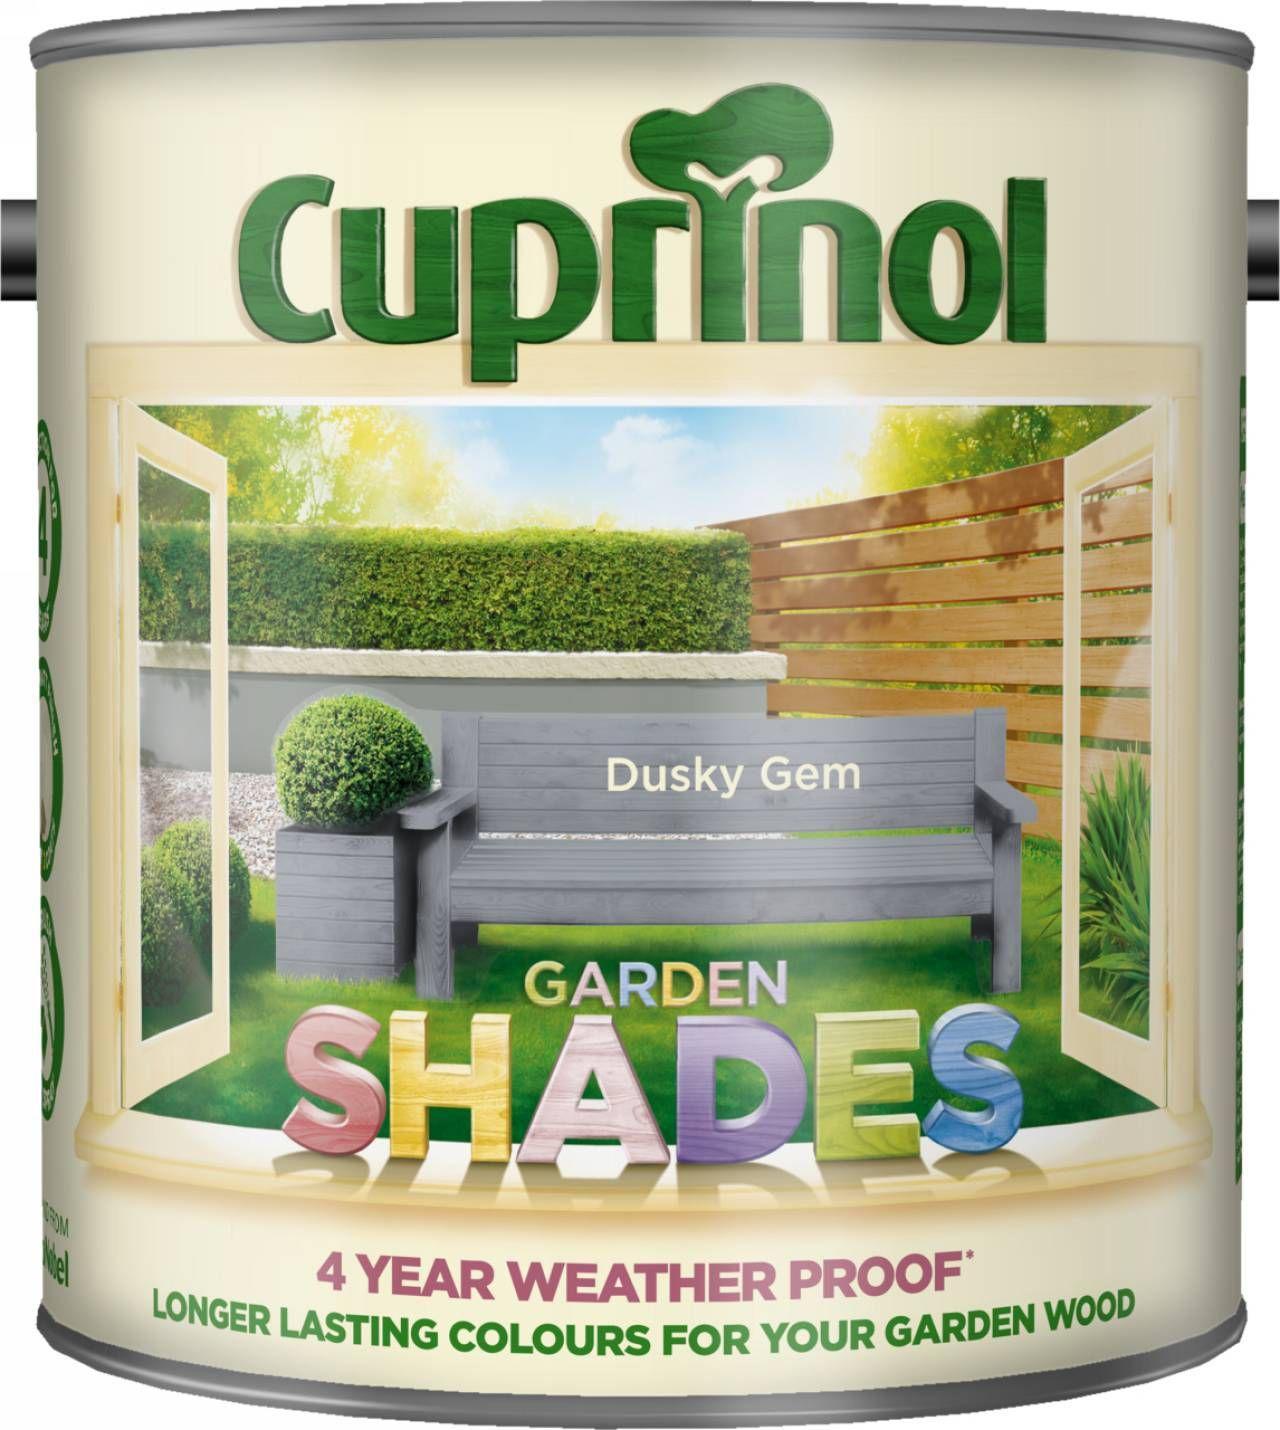 Cuprinol Garden Shades Dusky Gem Wood Paint 2.5L